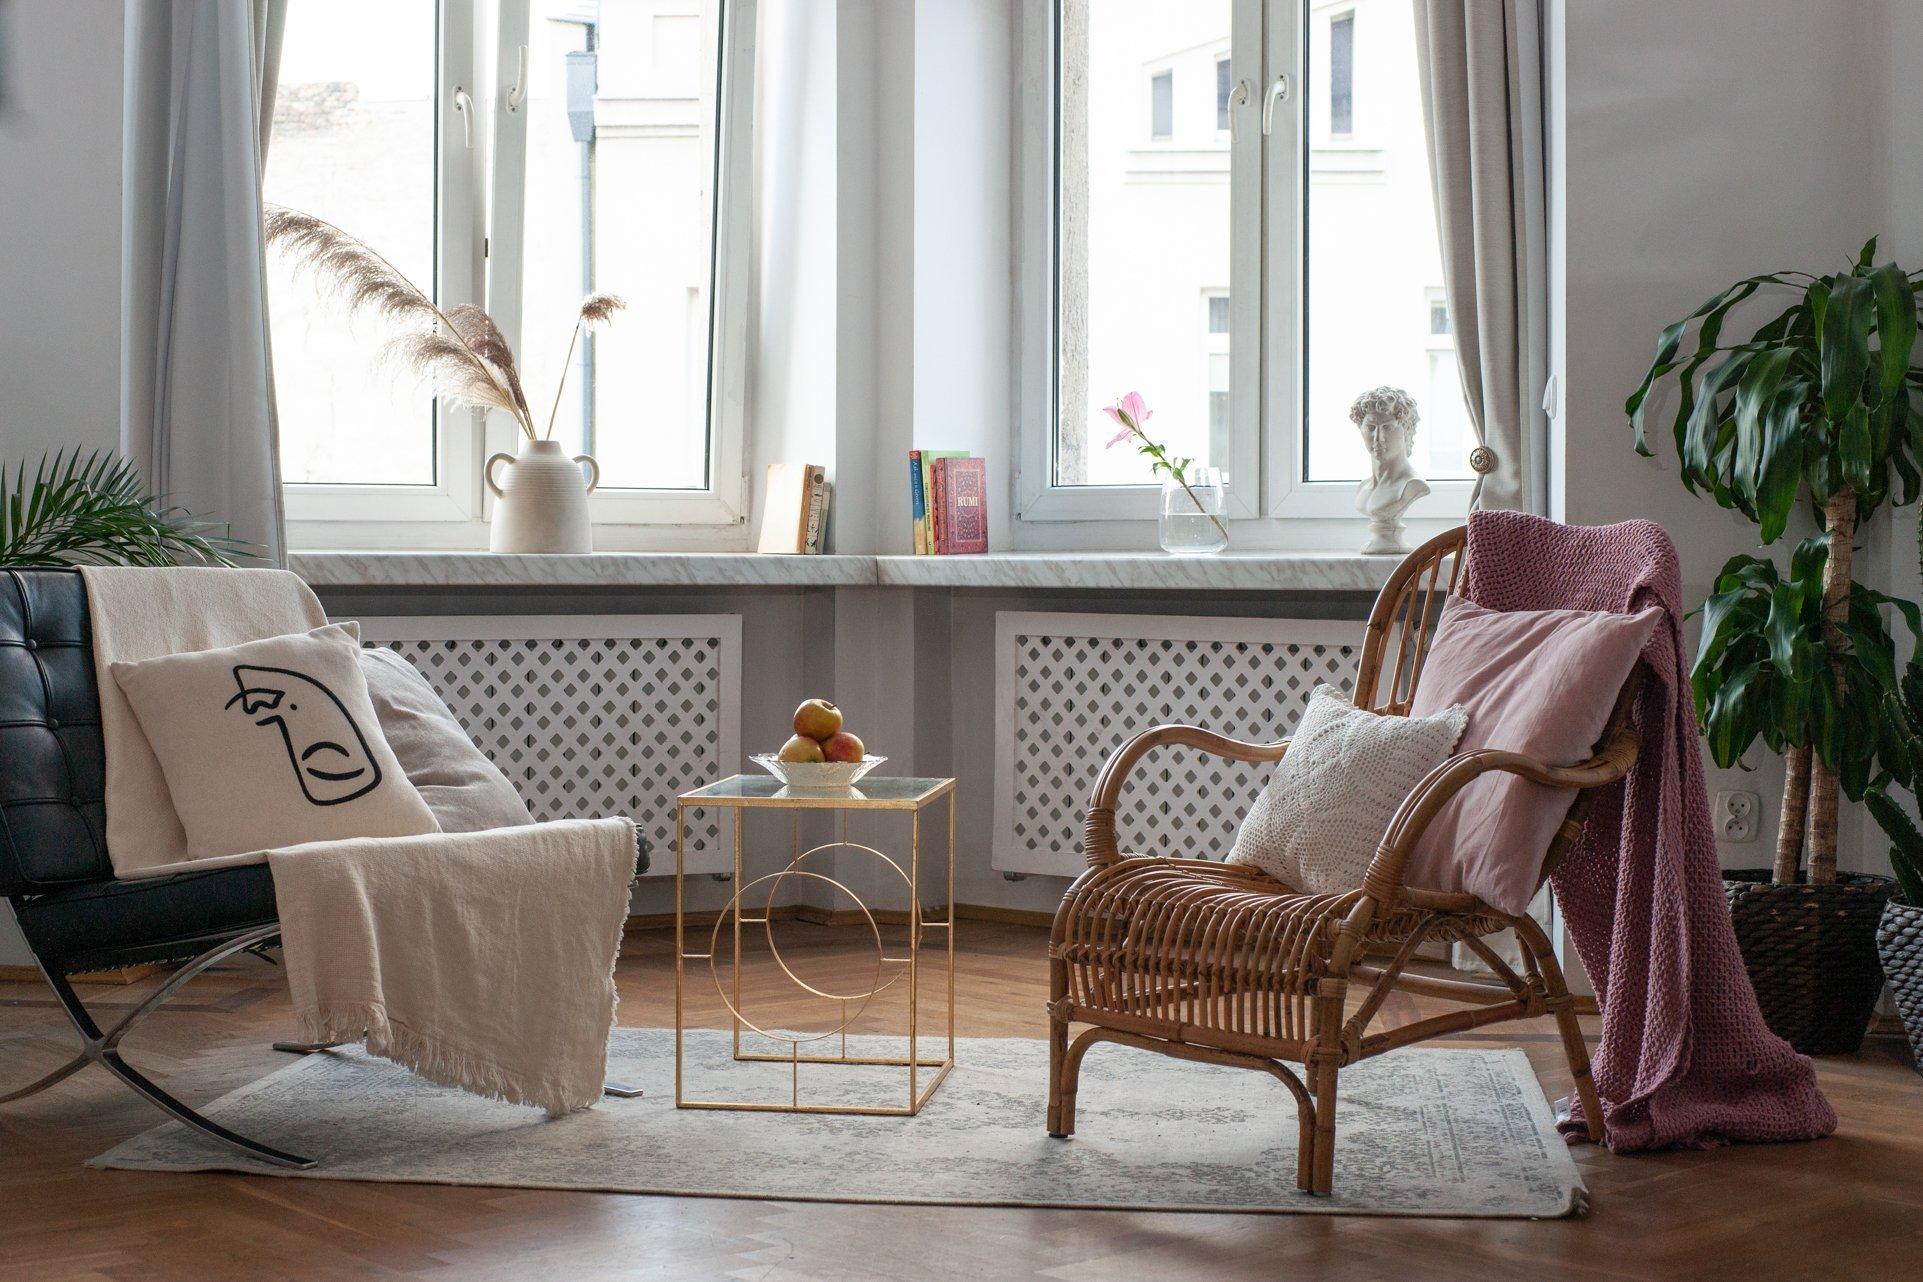 Kamila's soulful and relaxing coaching space